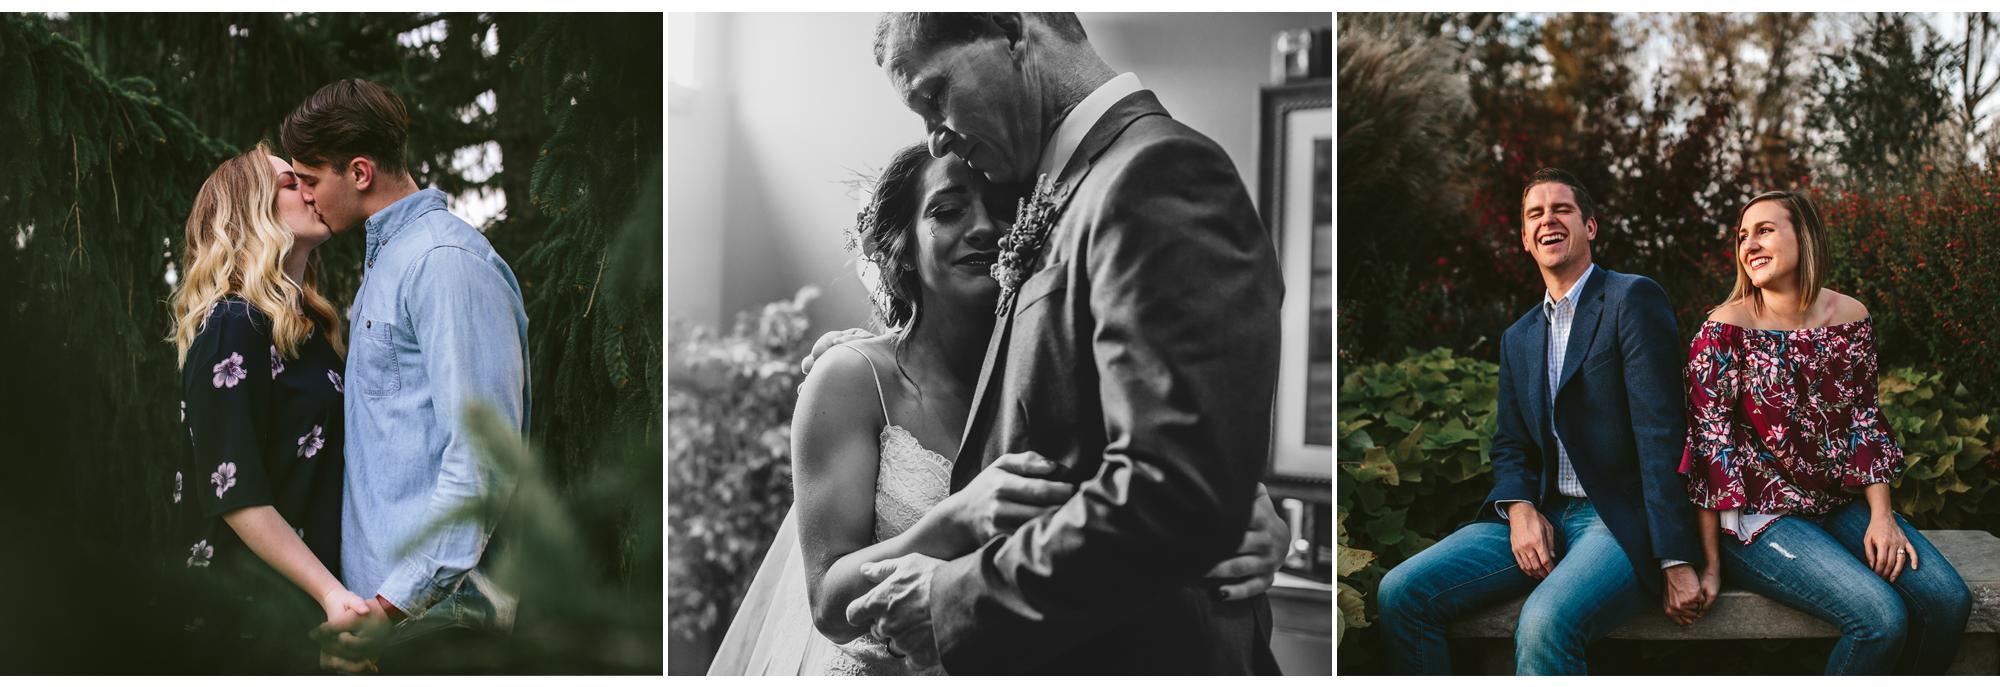 missouri-wedding-photographers.png